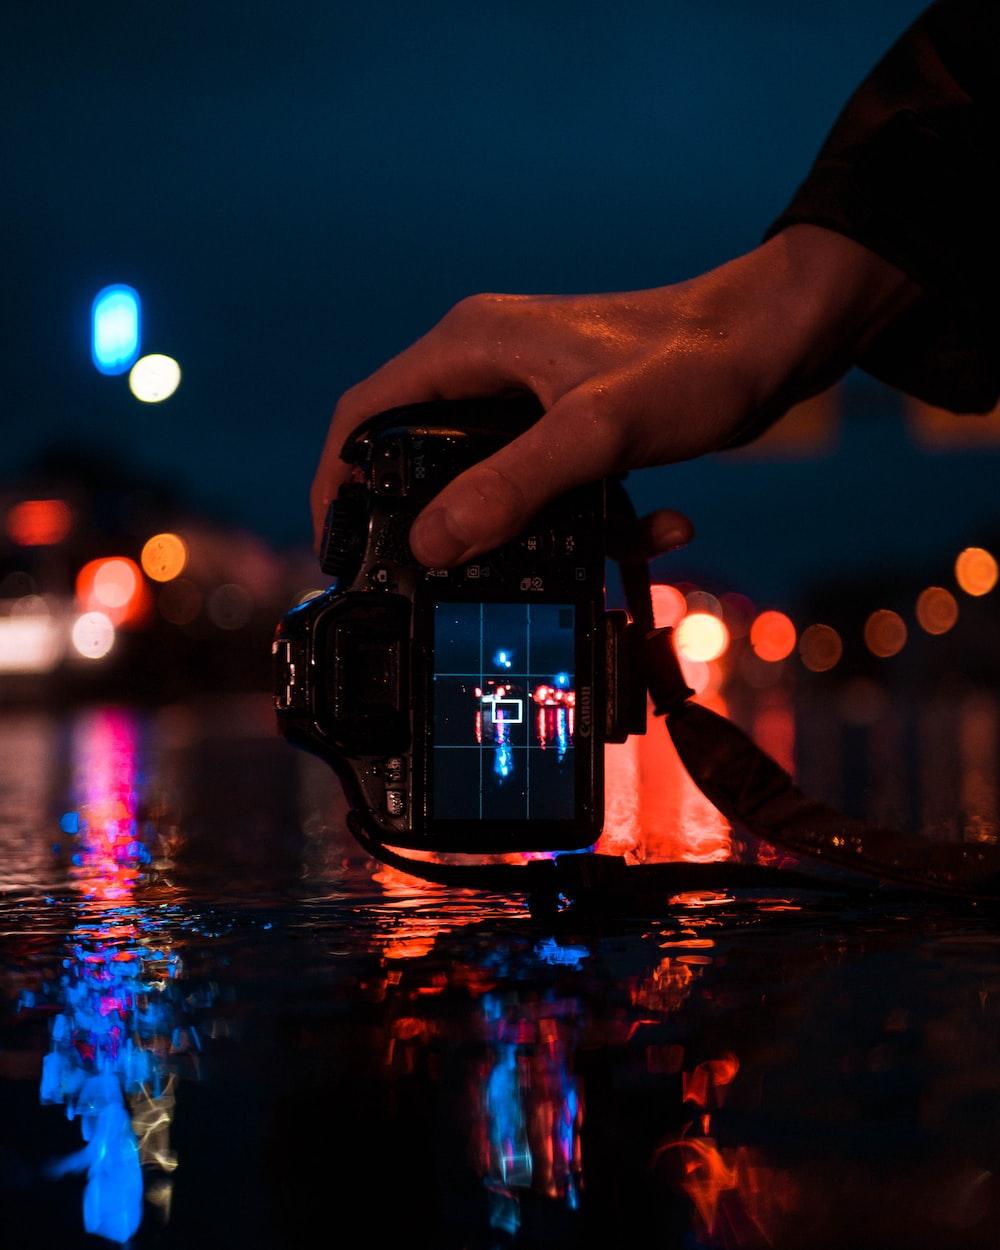 person holding black DSLR camera taking photo of LED lights